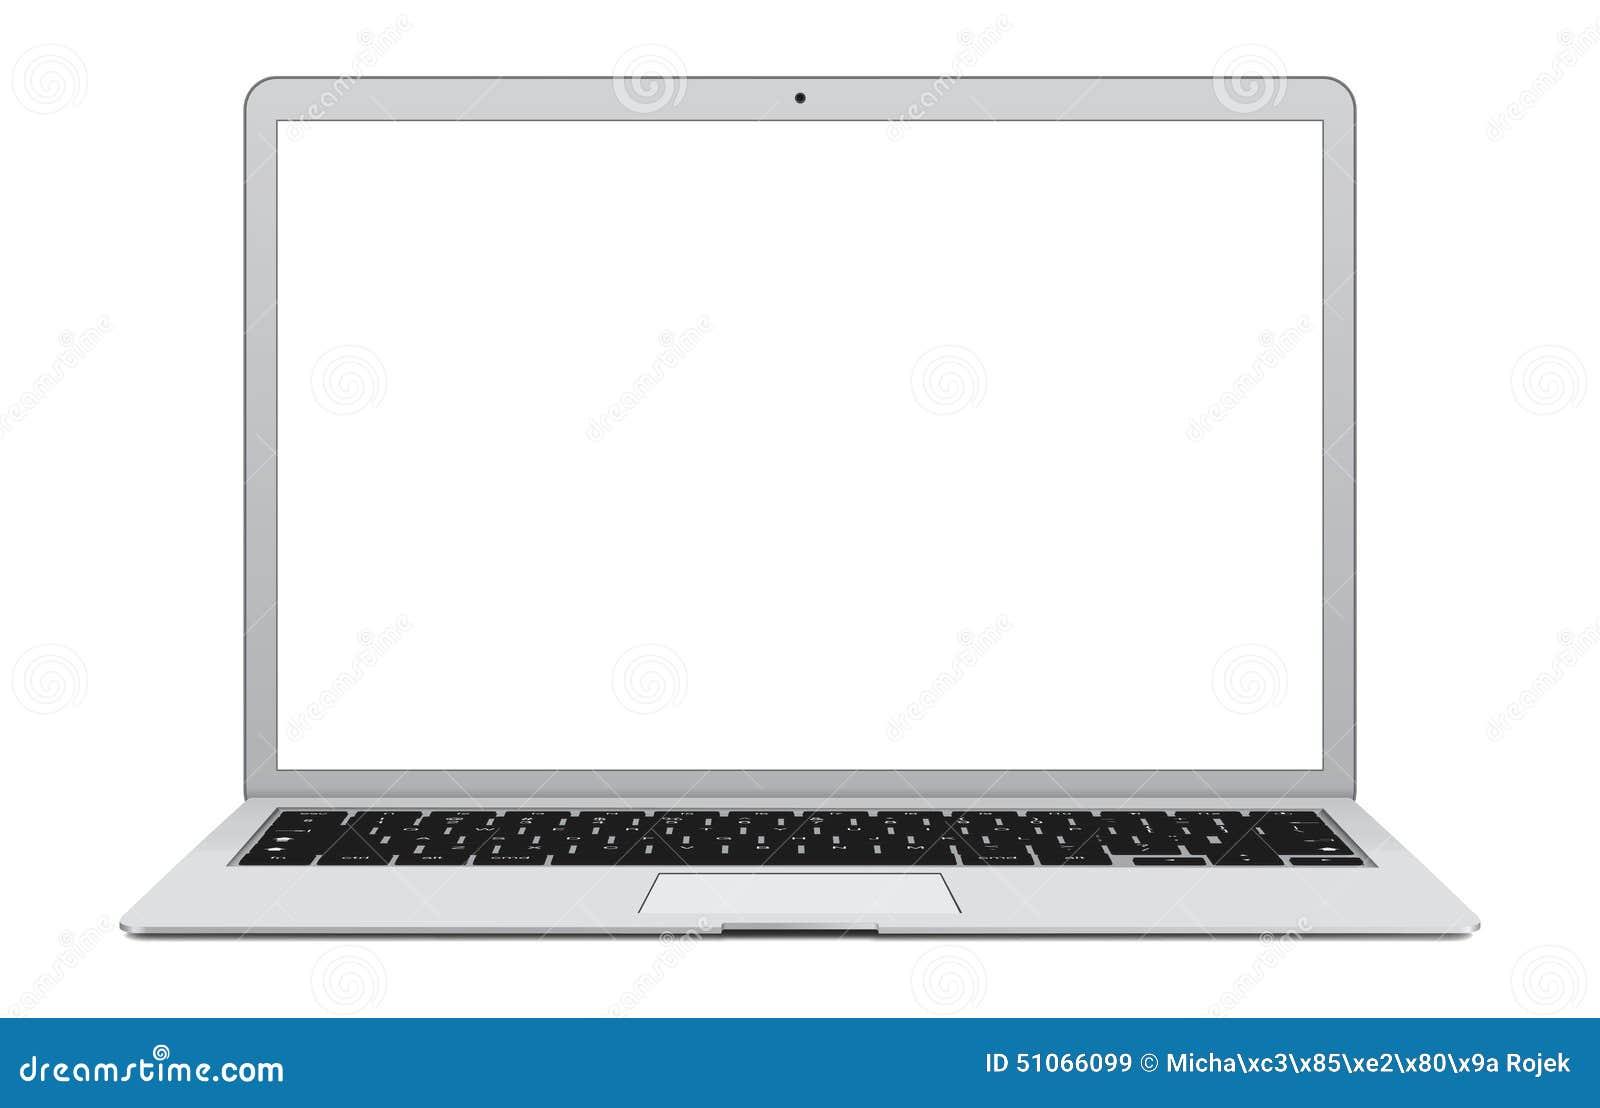 Pusty ekran laptopa